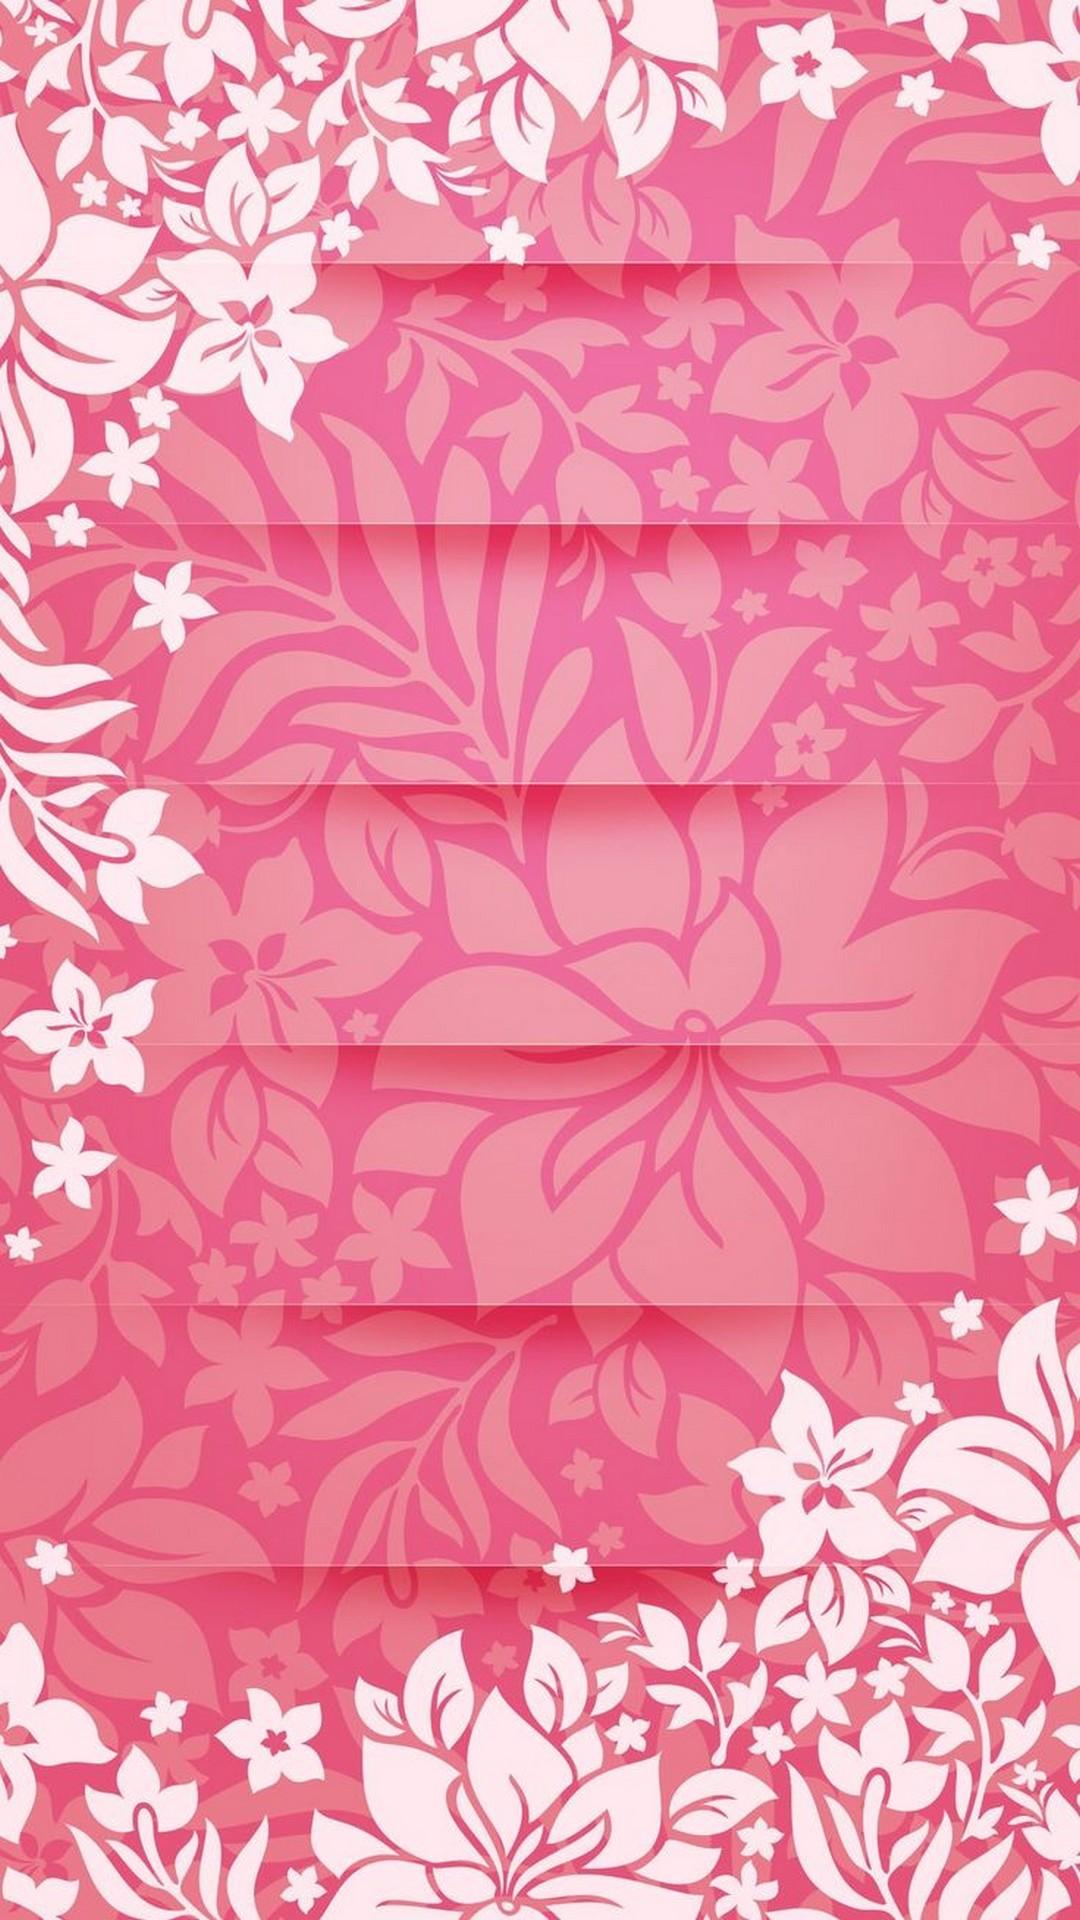 Cute Iphone X Wallpaper Hd 2020 Phone Wallpaper Hd